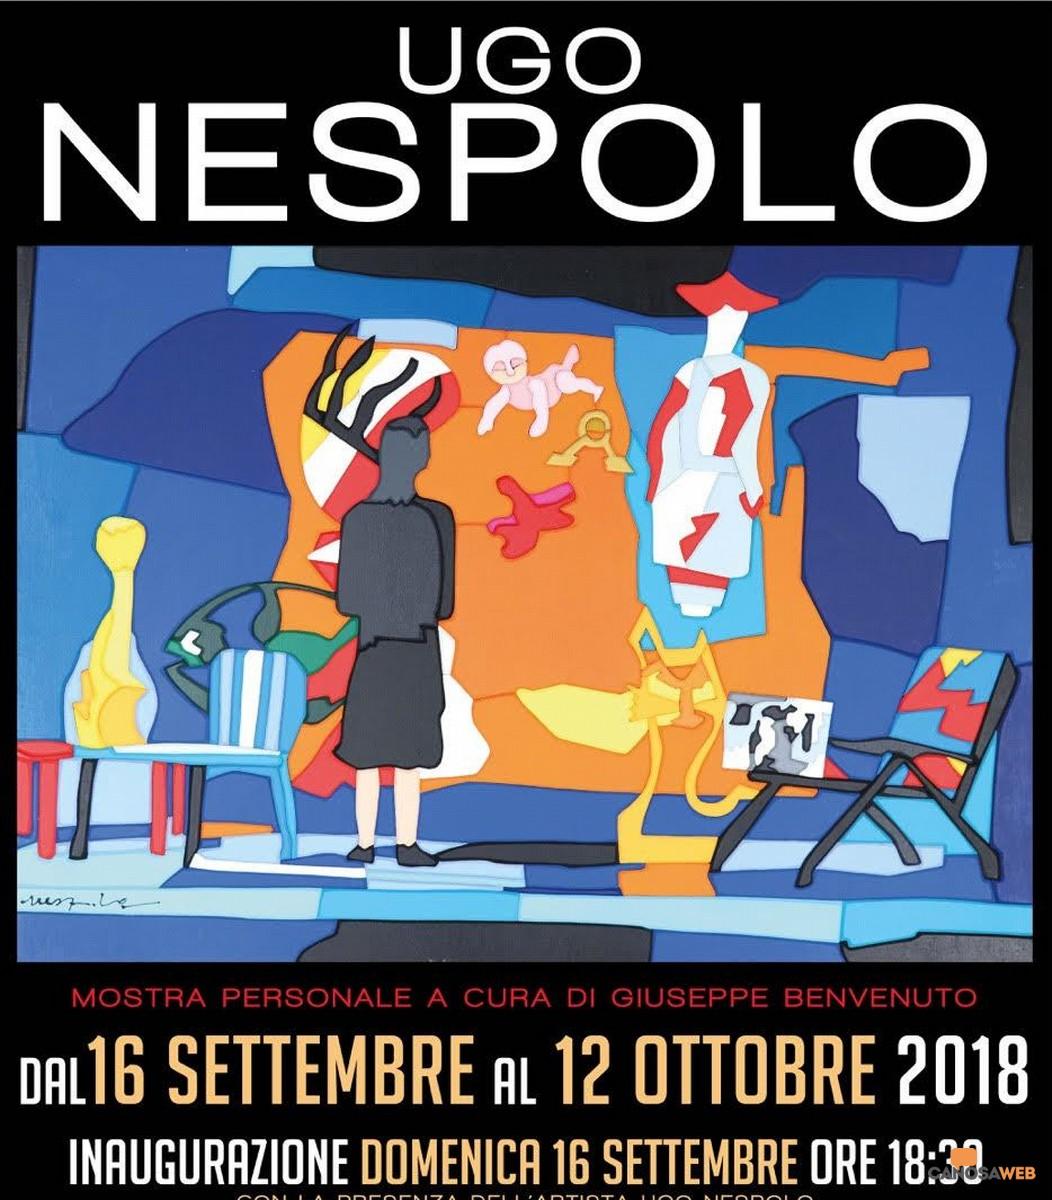 Avanguardia educata :Ugo Nespolo - Foggia